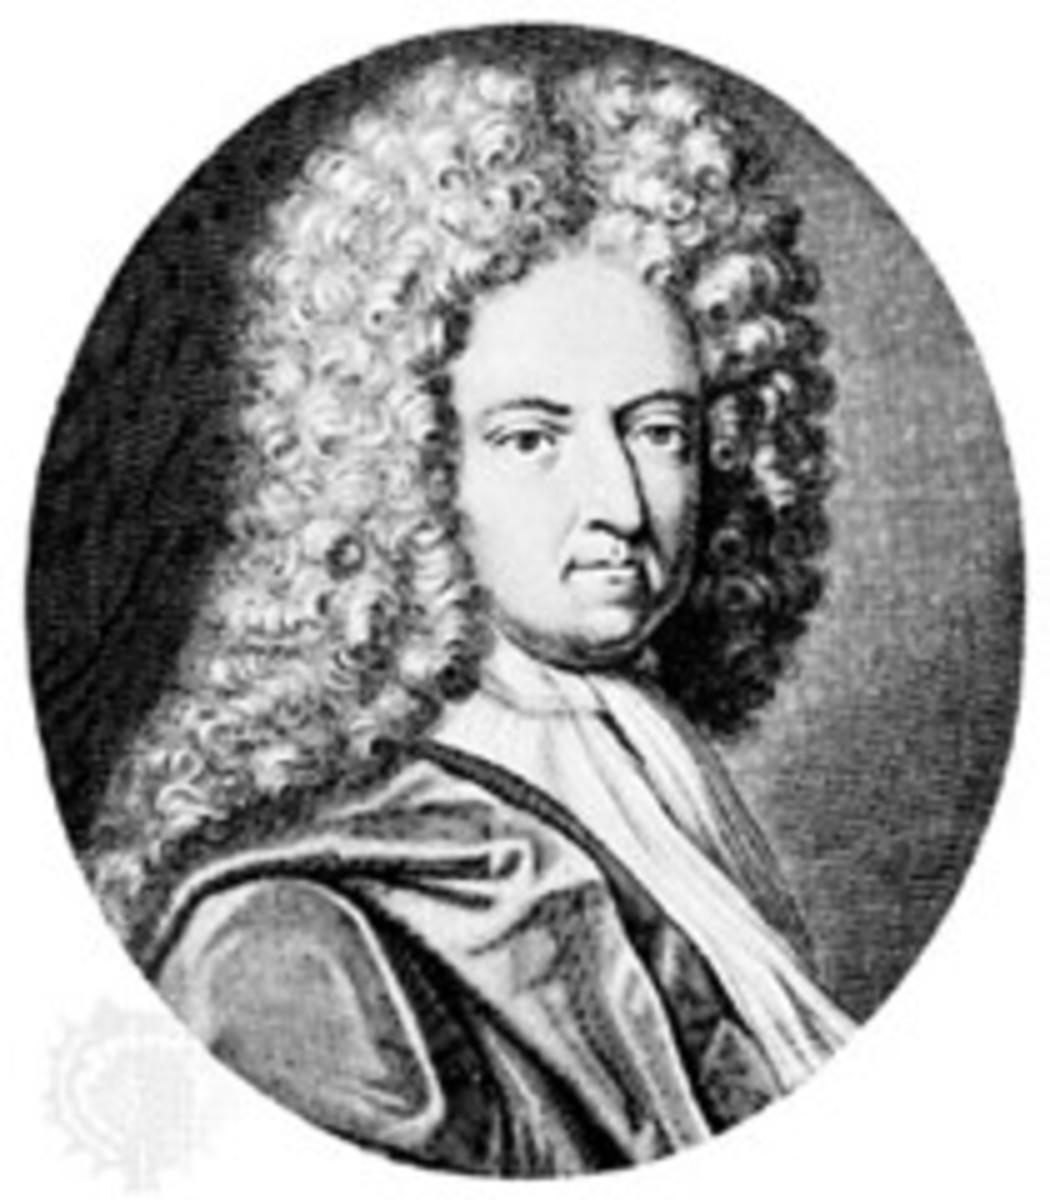 Daniel Defoe Author of Robinson Crusoe